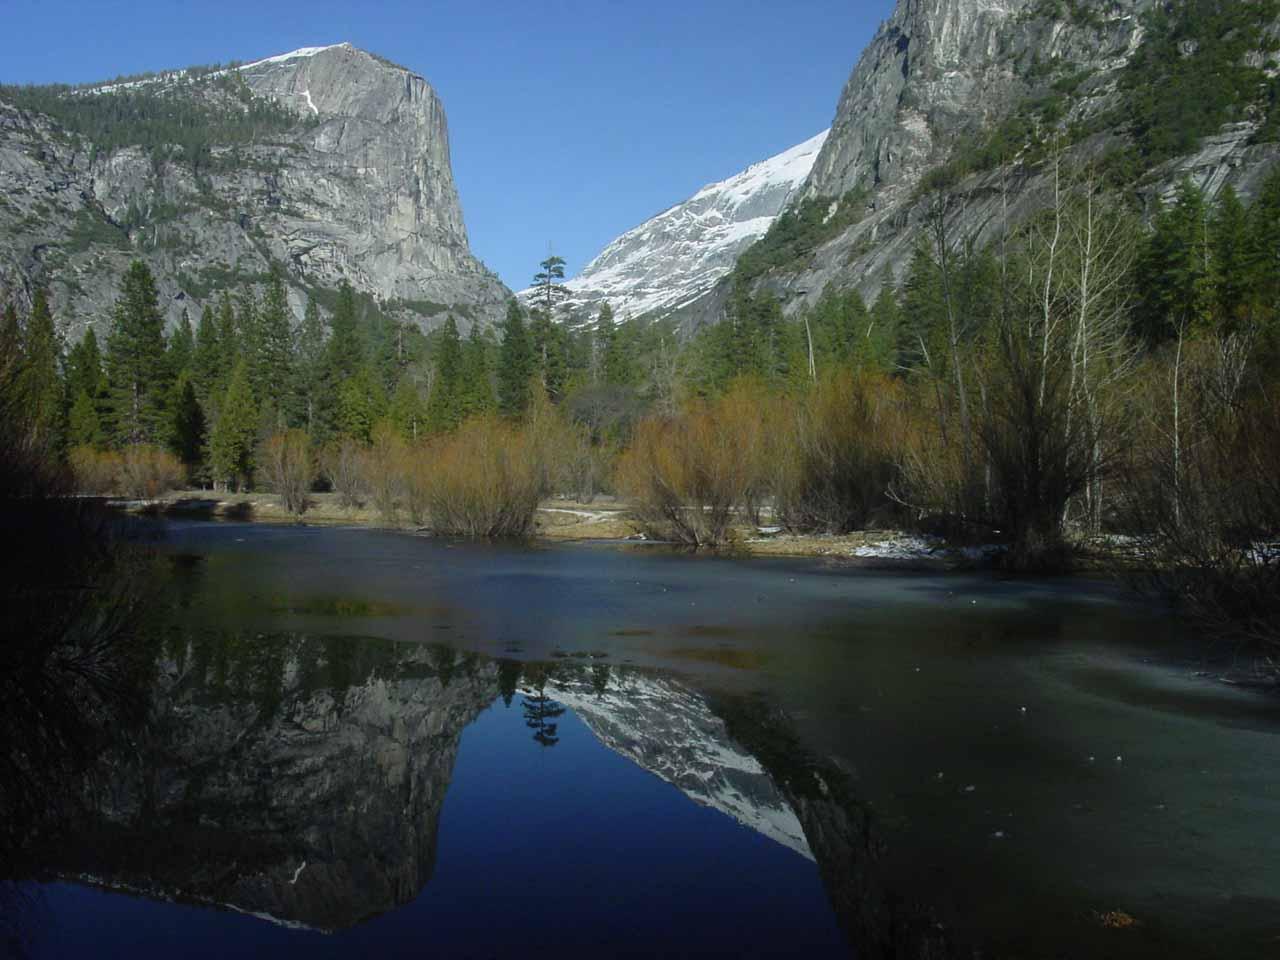 The partially frozen Mirror Lake